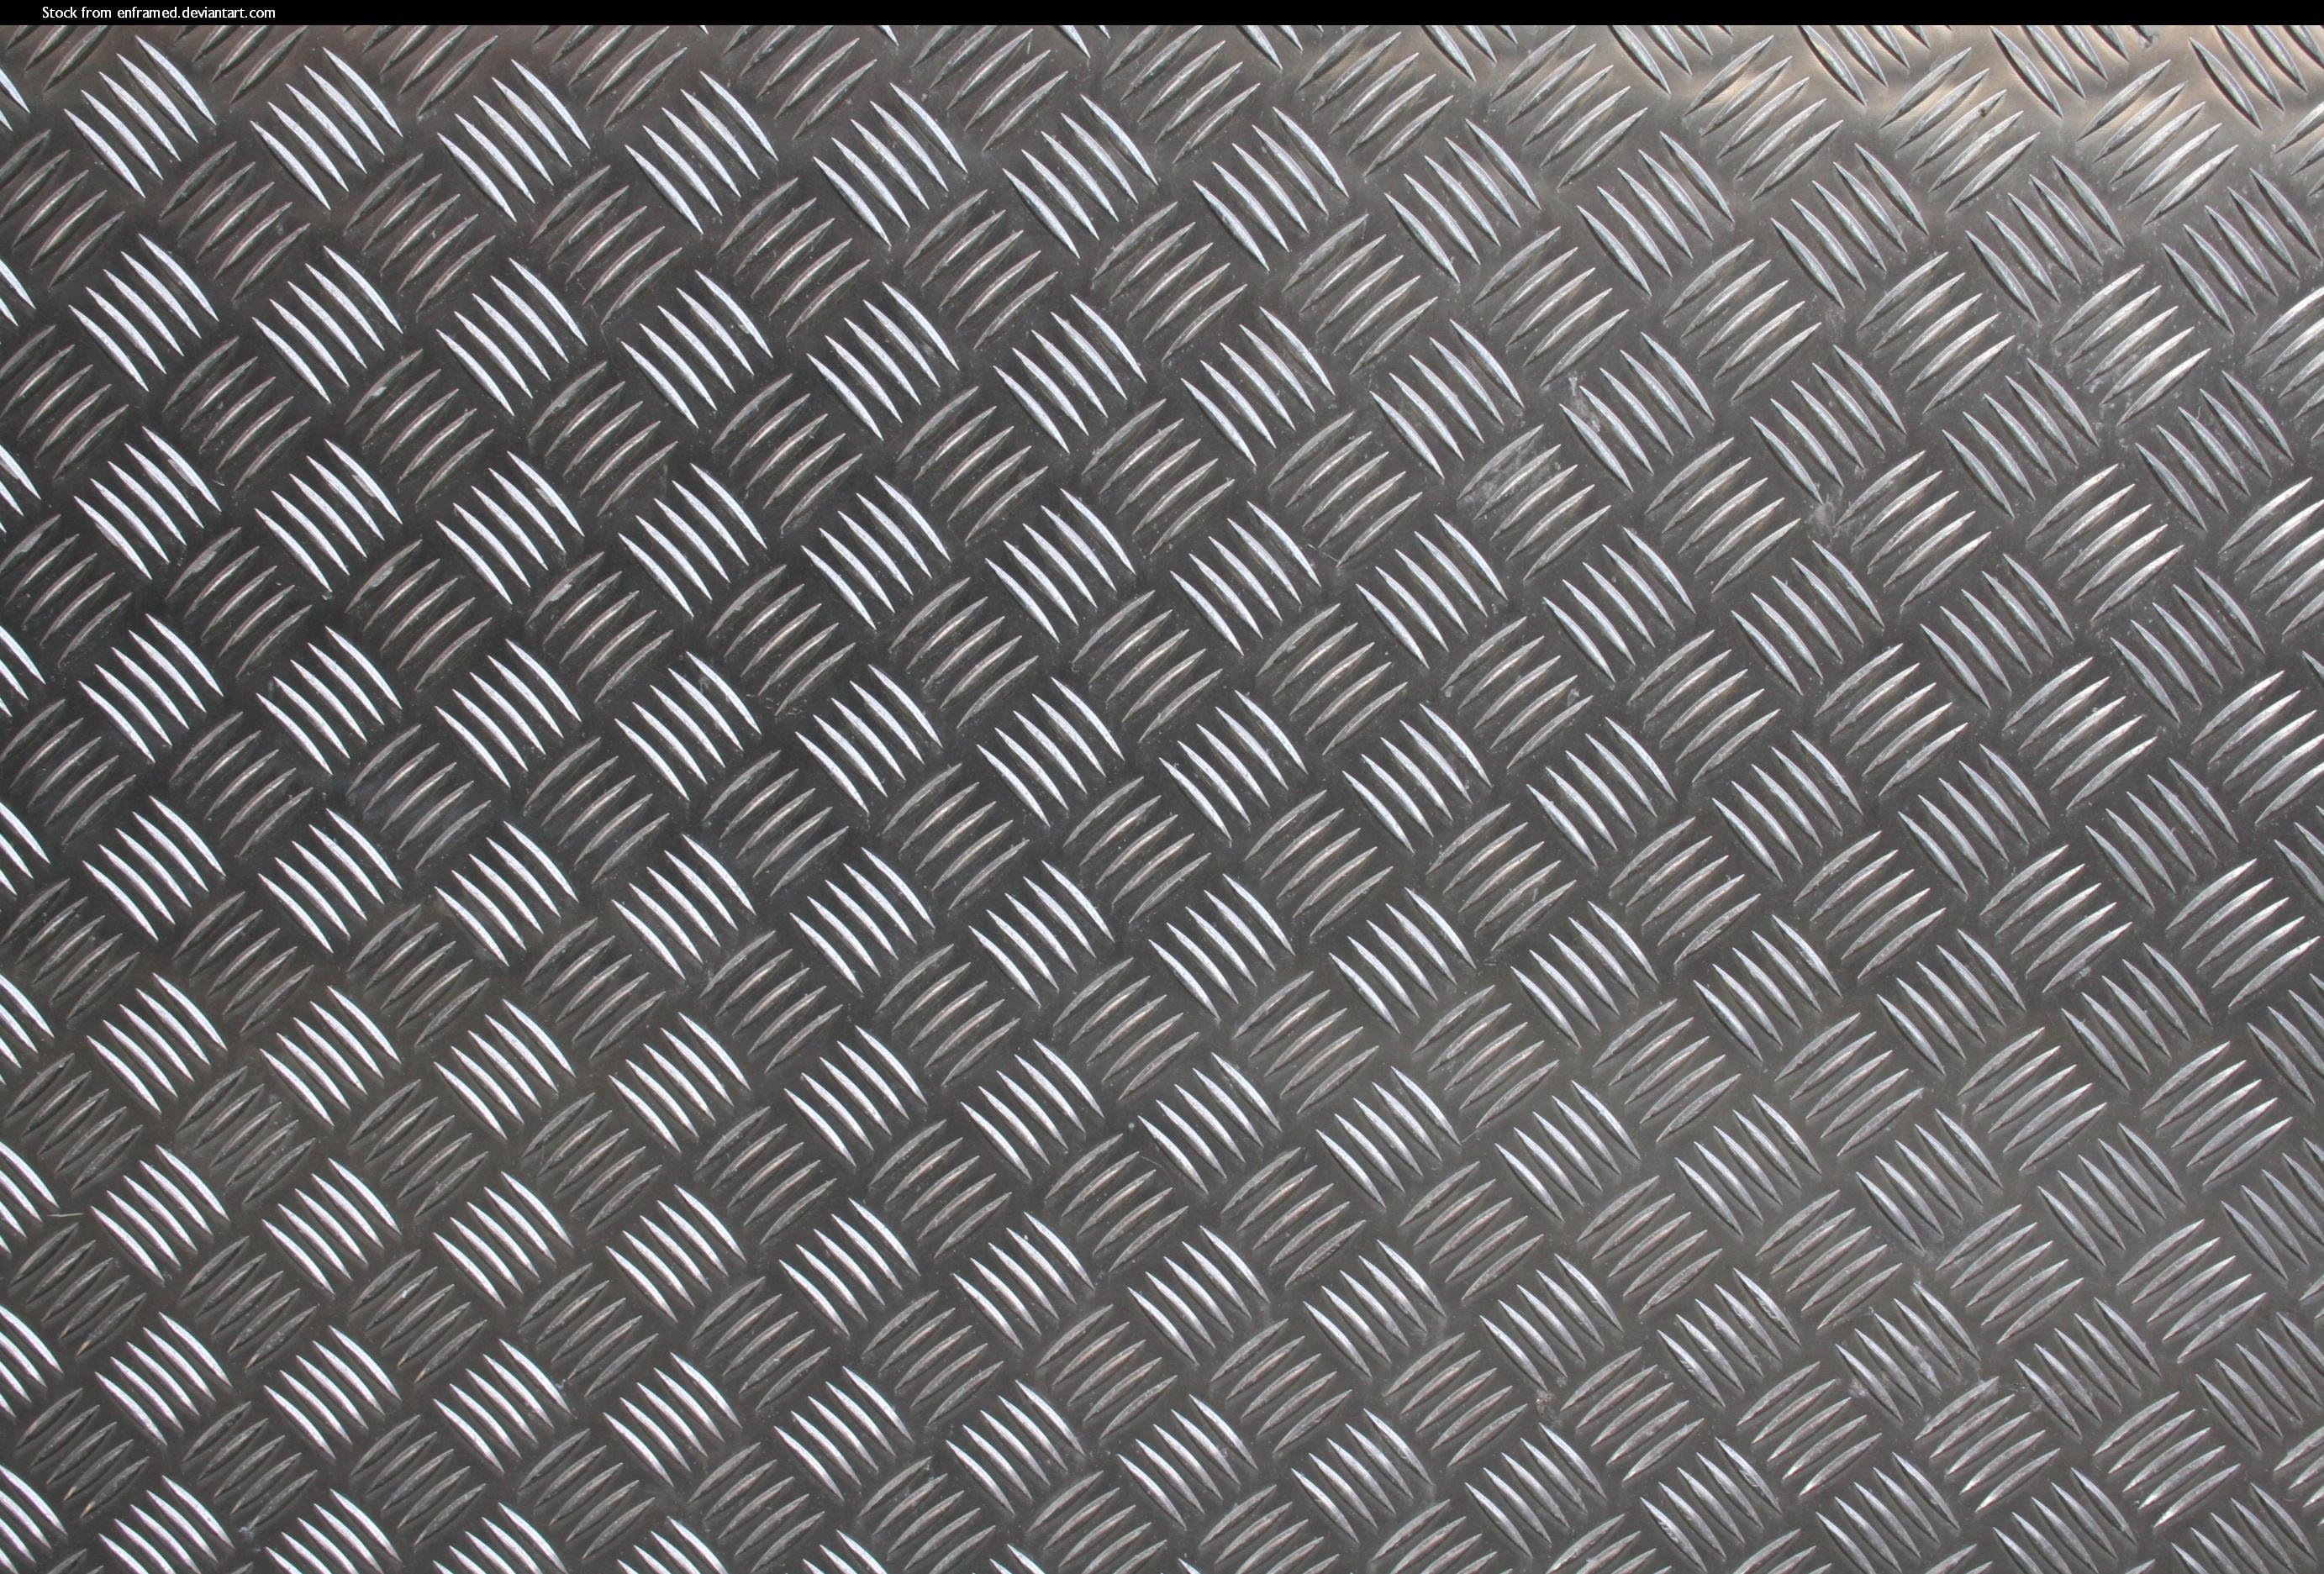 Metal texture 3 by enframed on DeviantArt